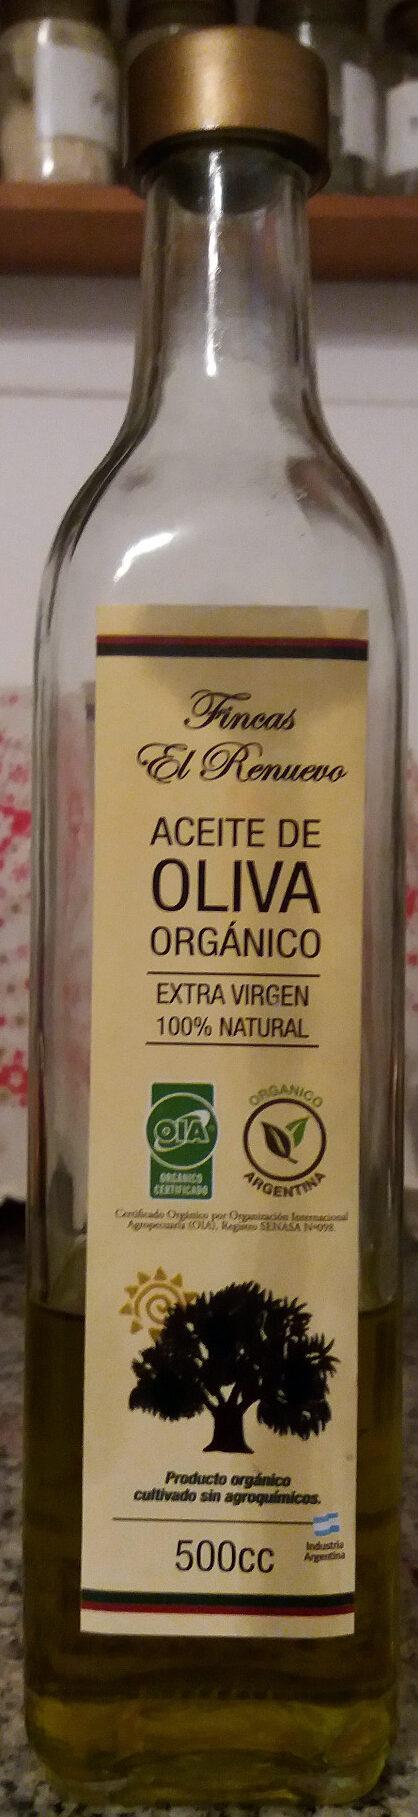 Aceite de oliva orgánico - Produit - es